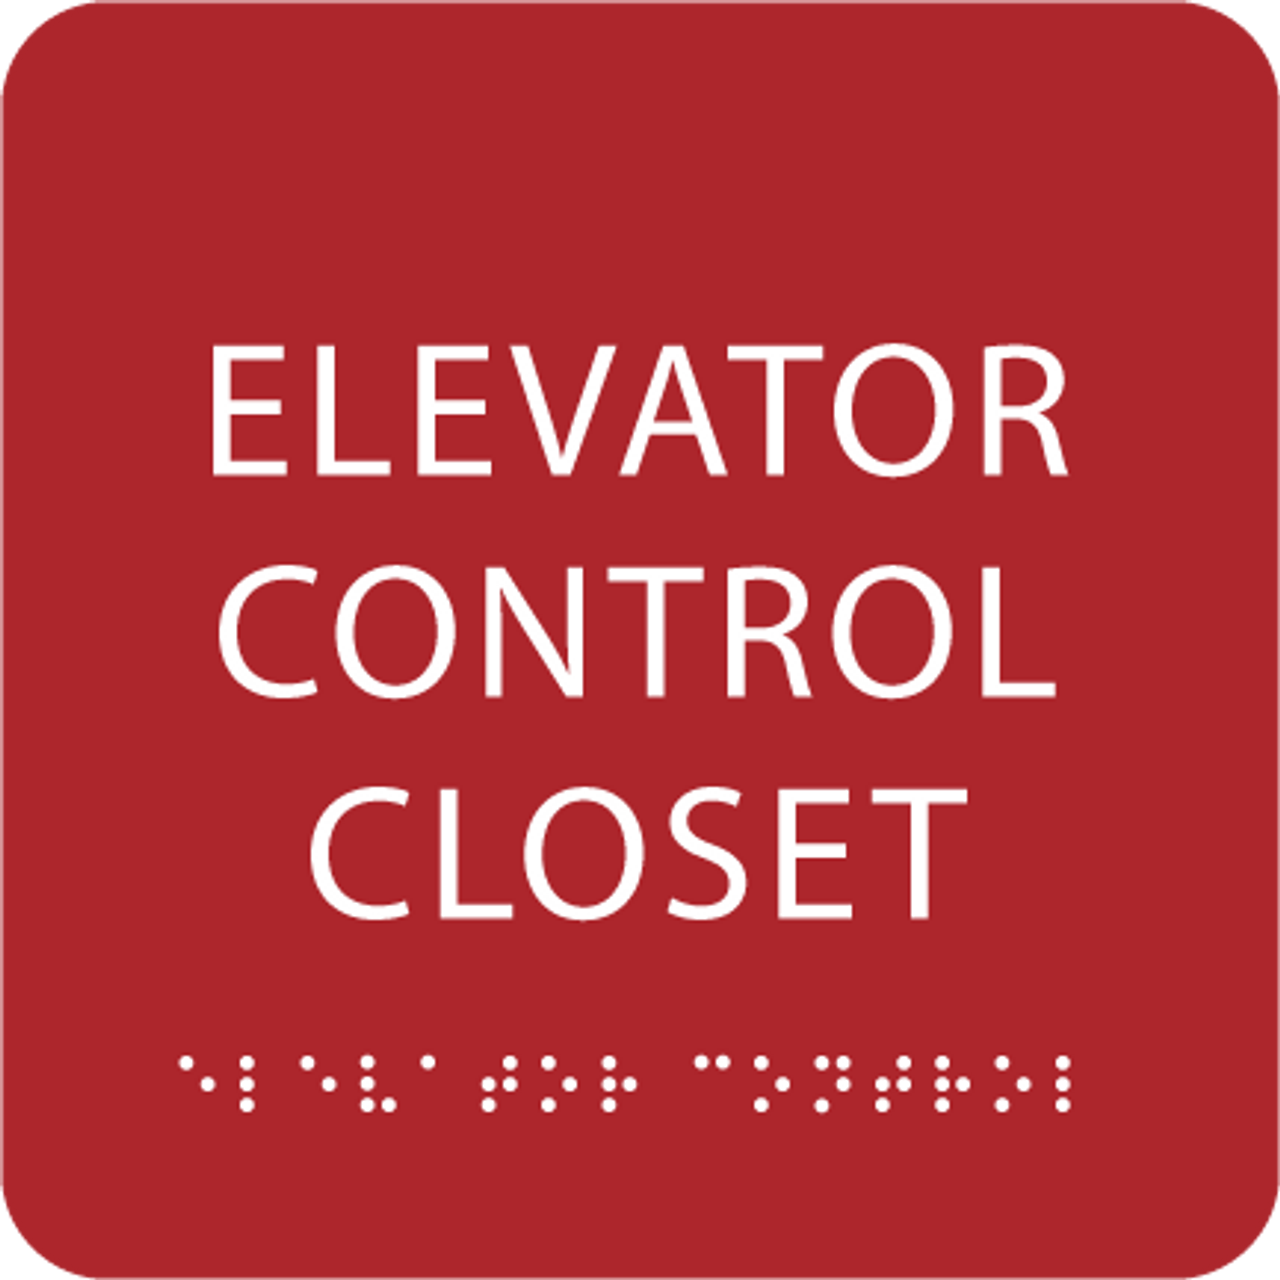 Red Elevator Control Closet ADA Sign